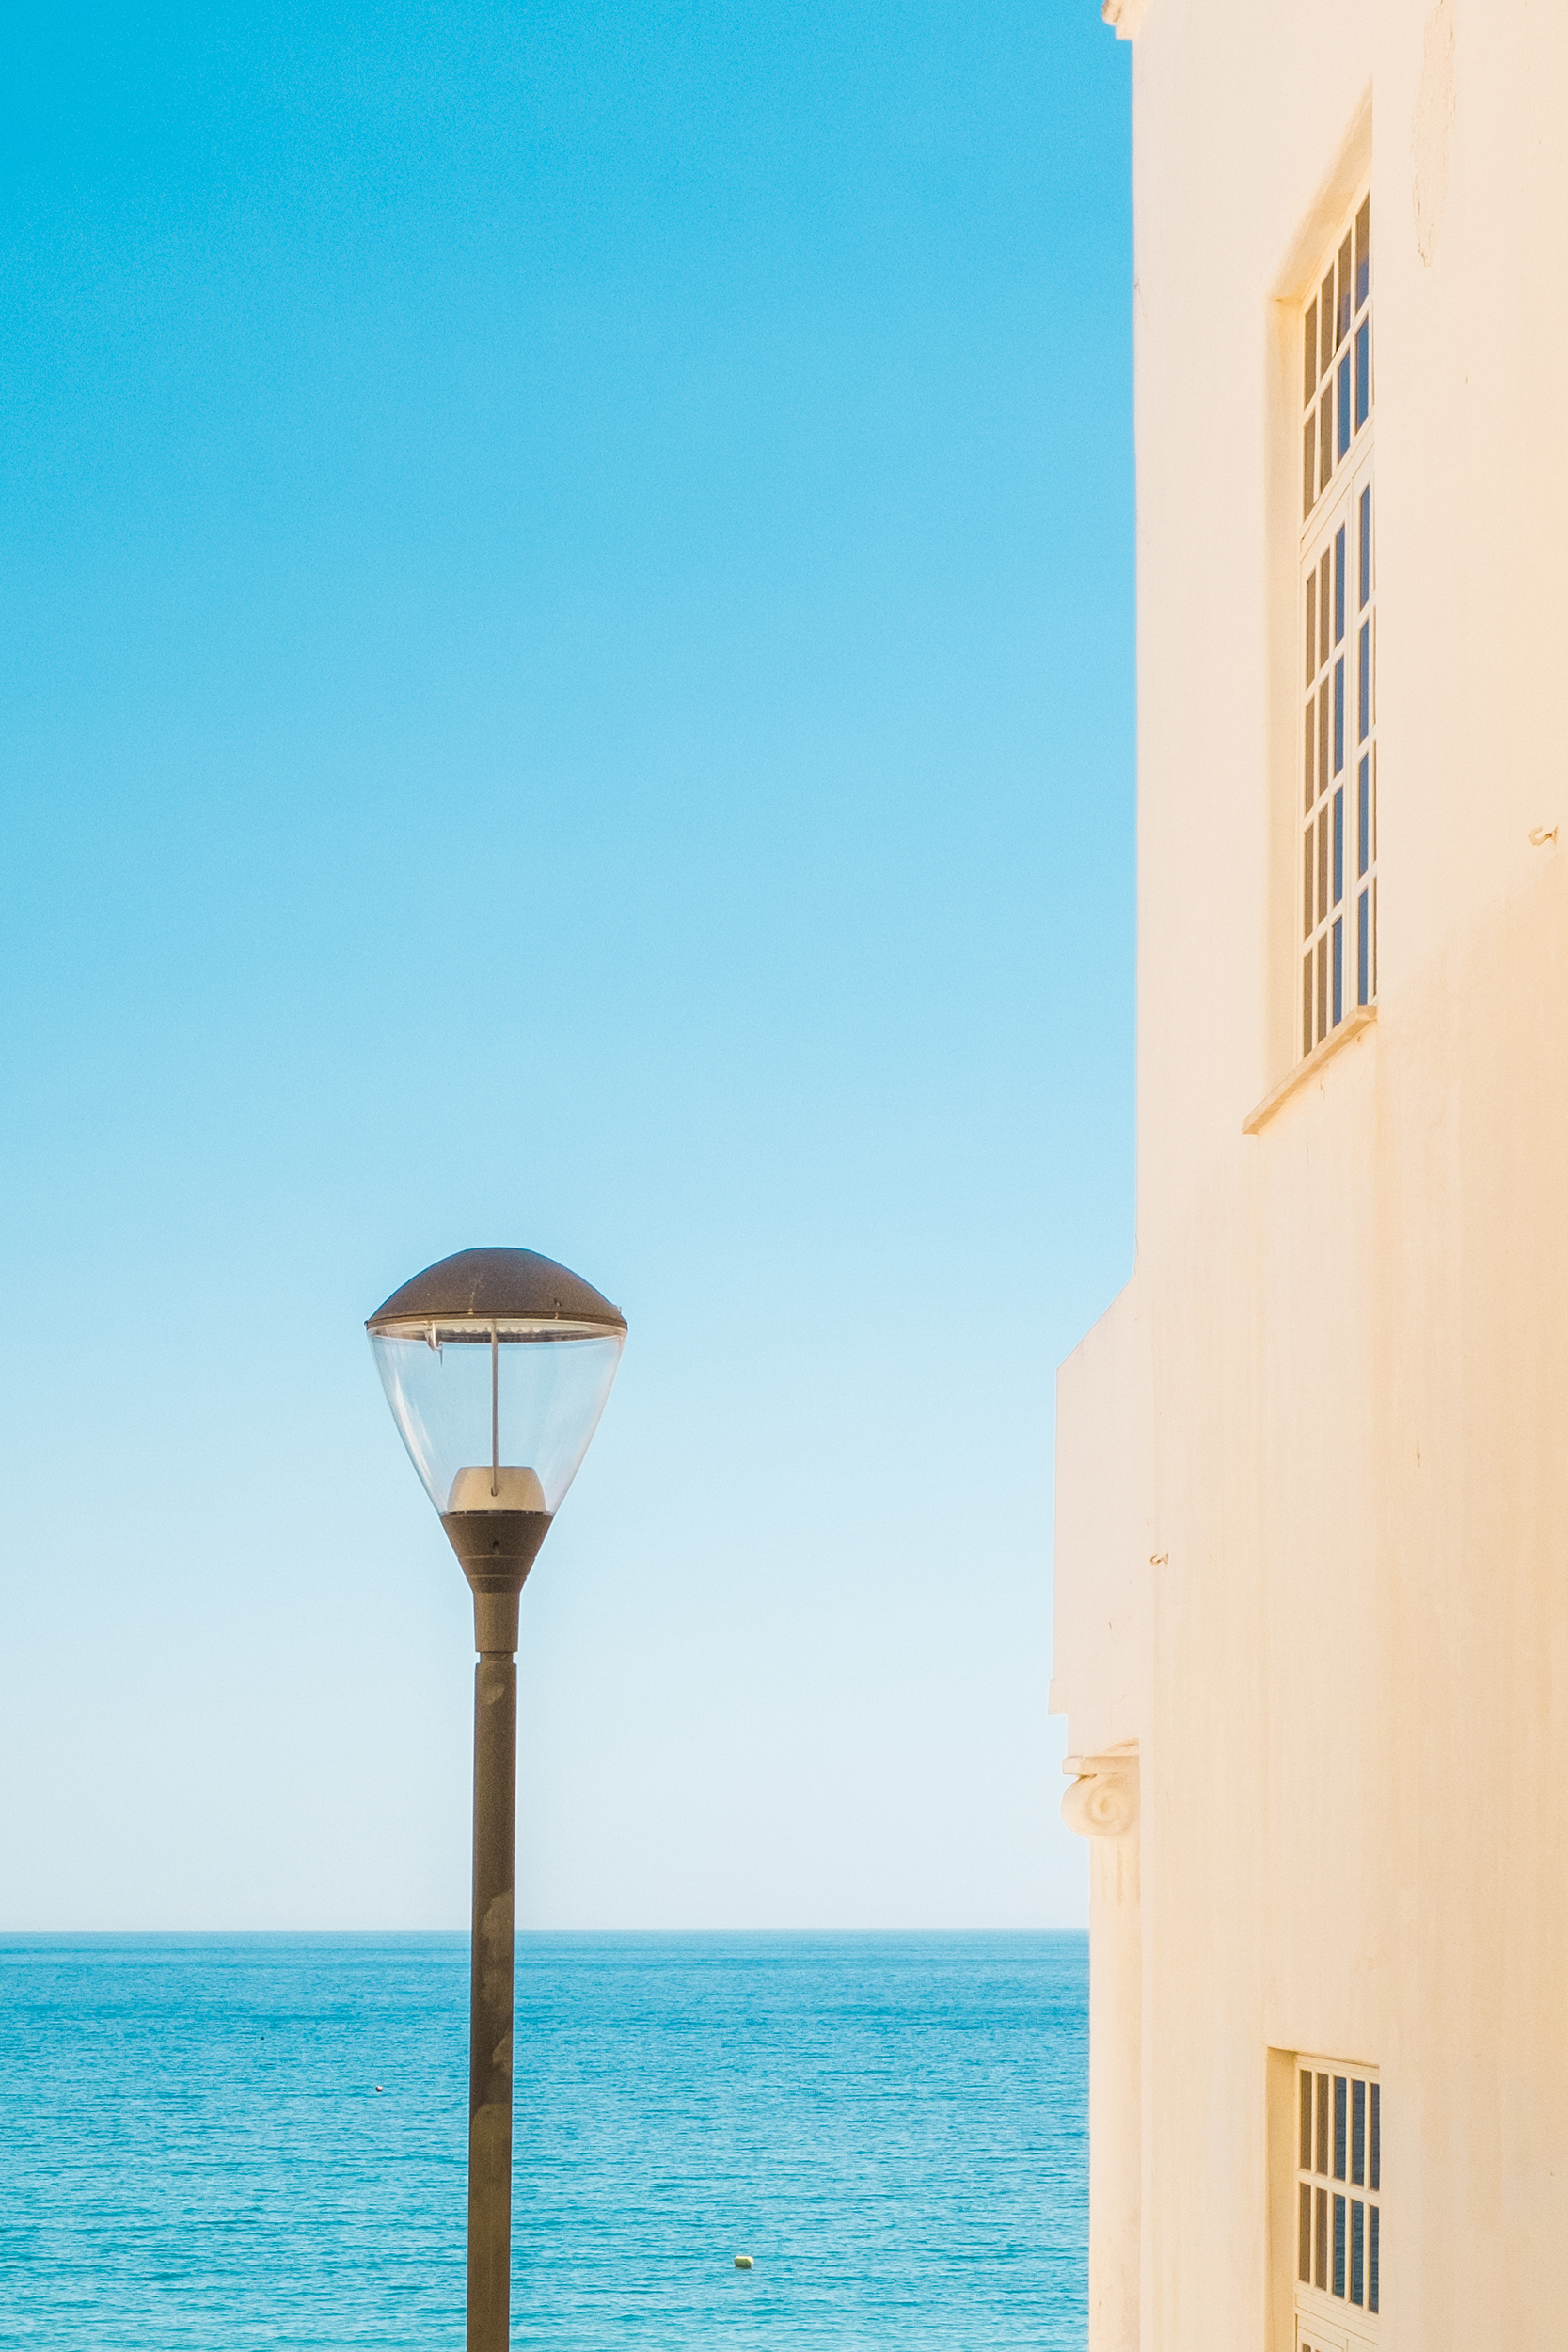 Ocean View, Algarve, Portugal